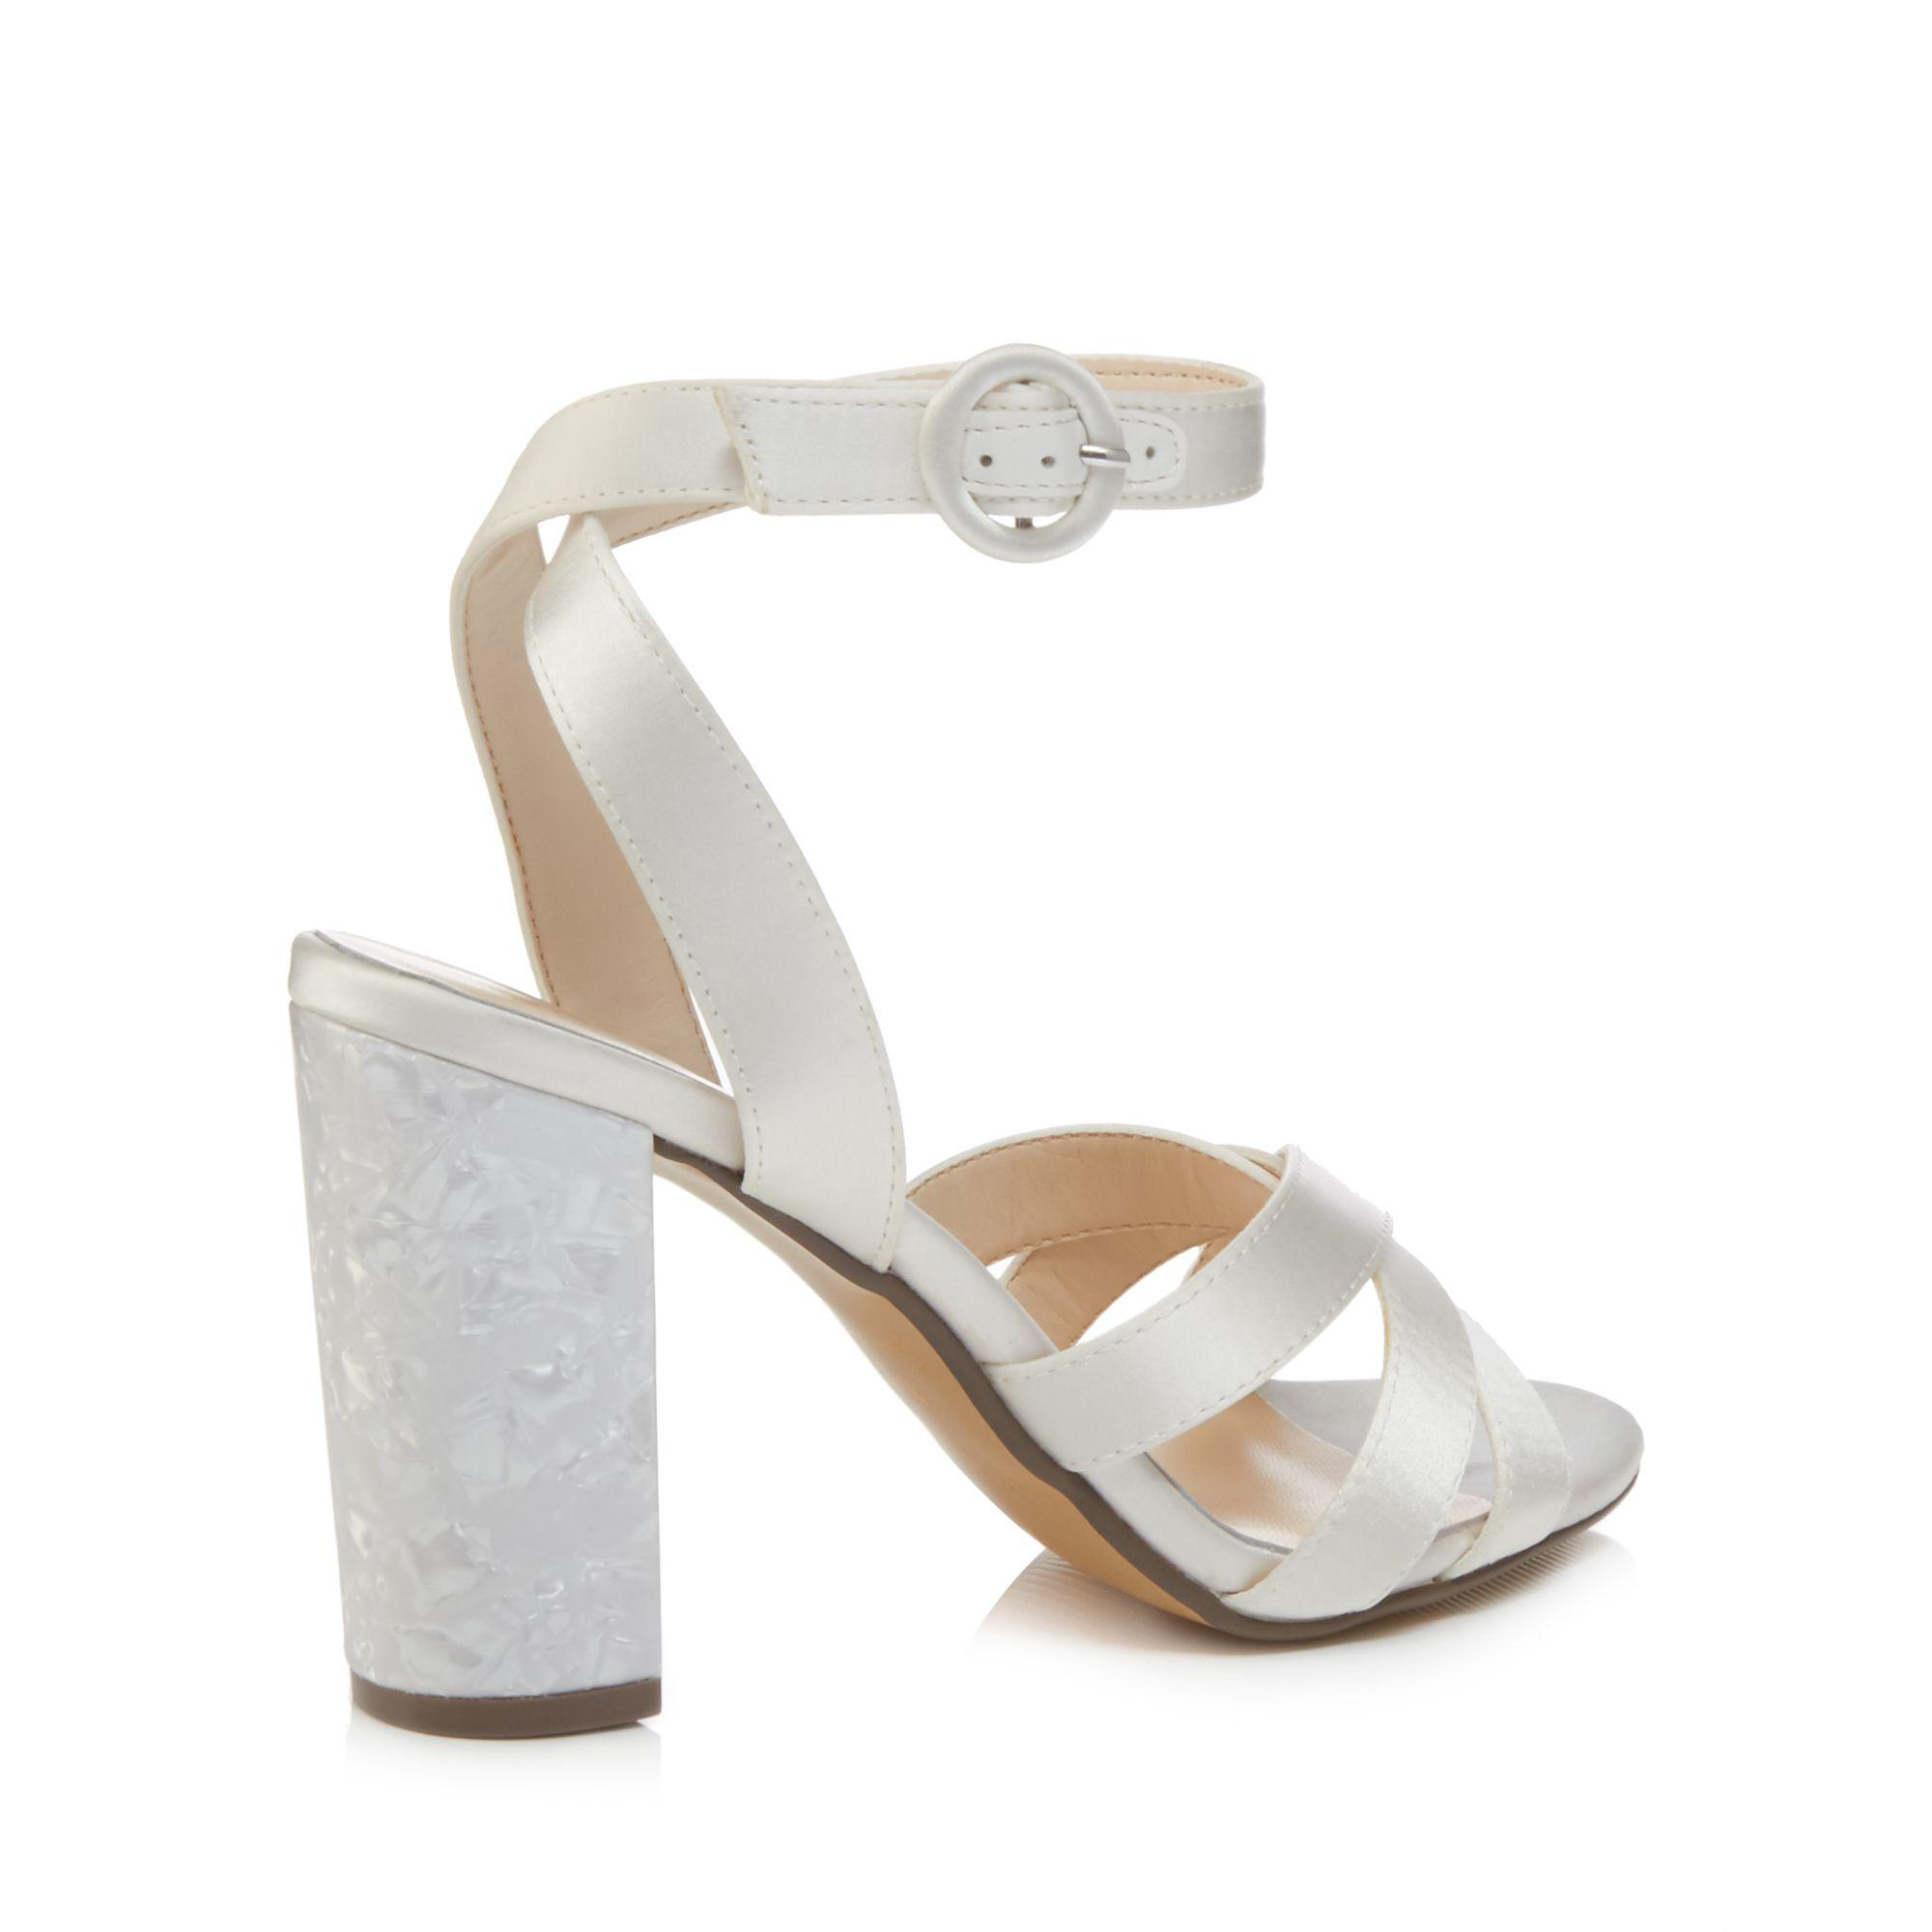 49c846099f6 Jenny Packham - White Ivory Satin  pearl  High Block Heel Ankle Strap  Sandals -. View fullscreen